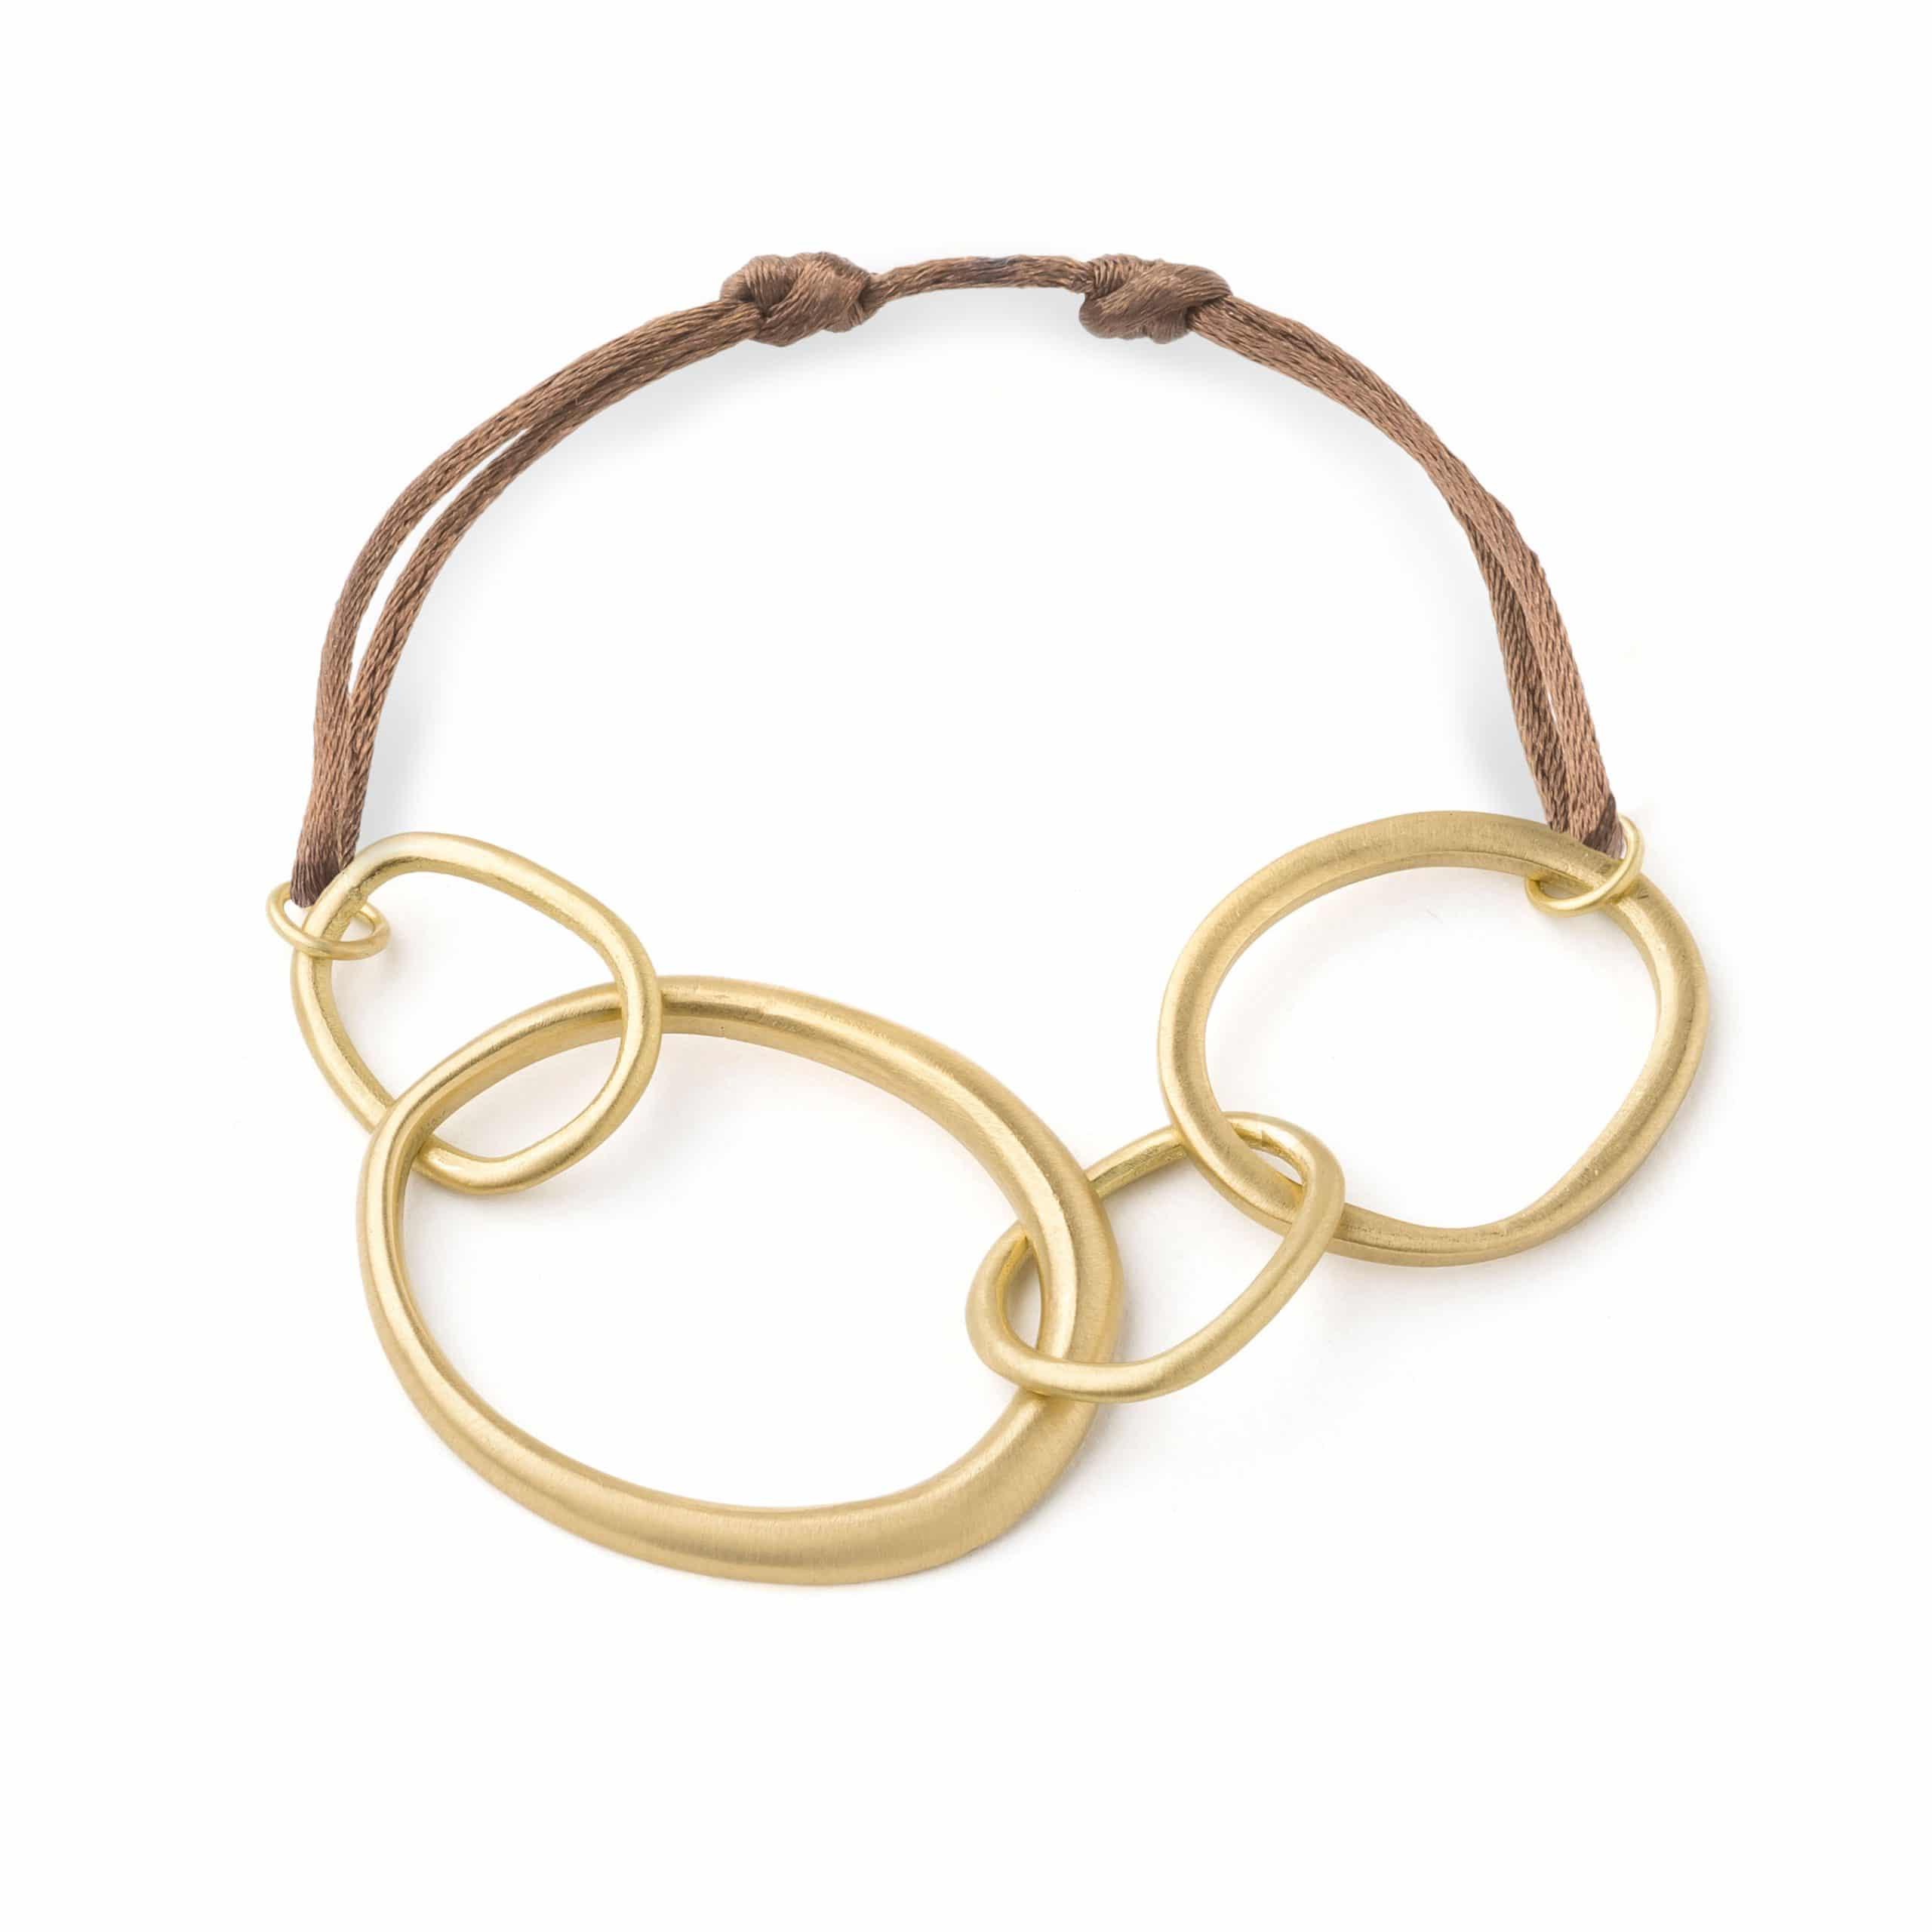 Bracelet lien anneaux or